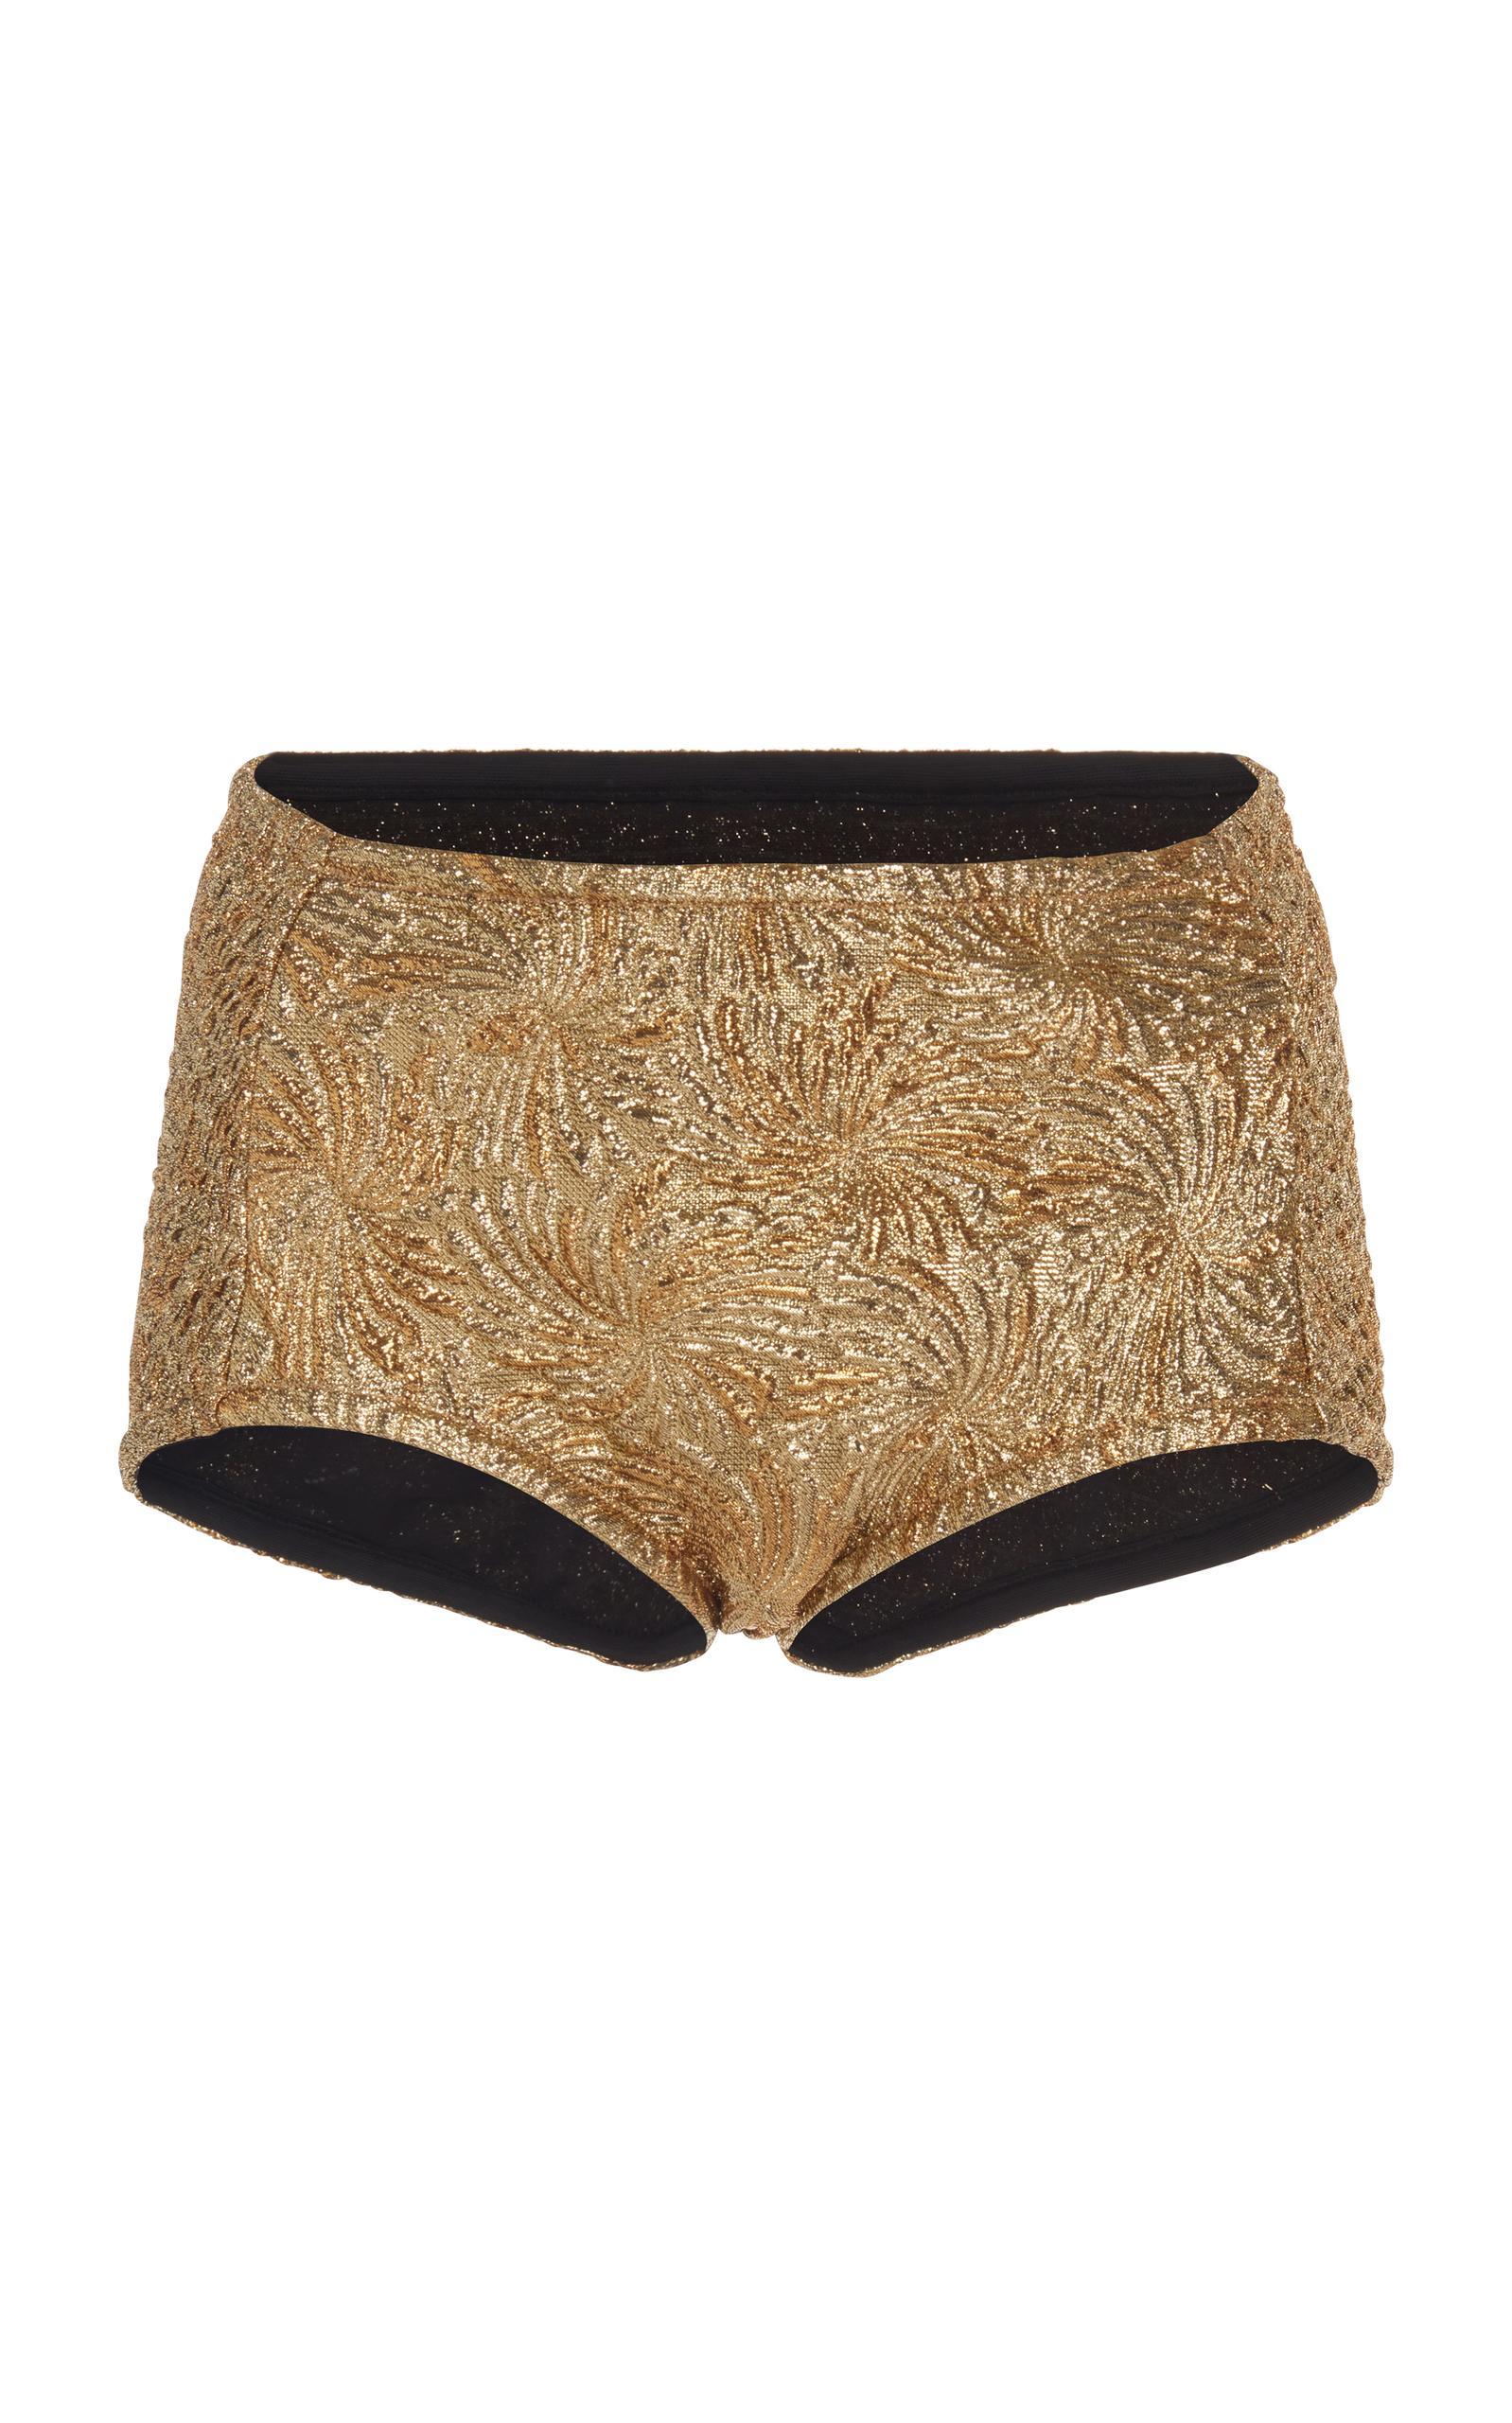 Maison Margiela Lame Cloque Bikini Bottoms In Gold